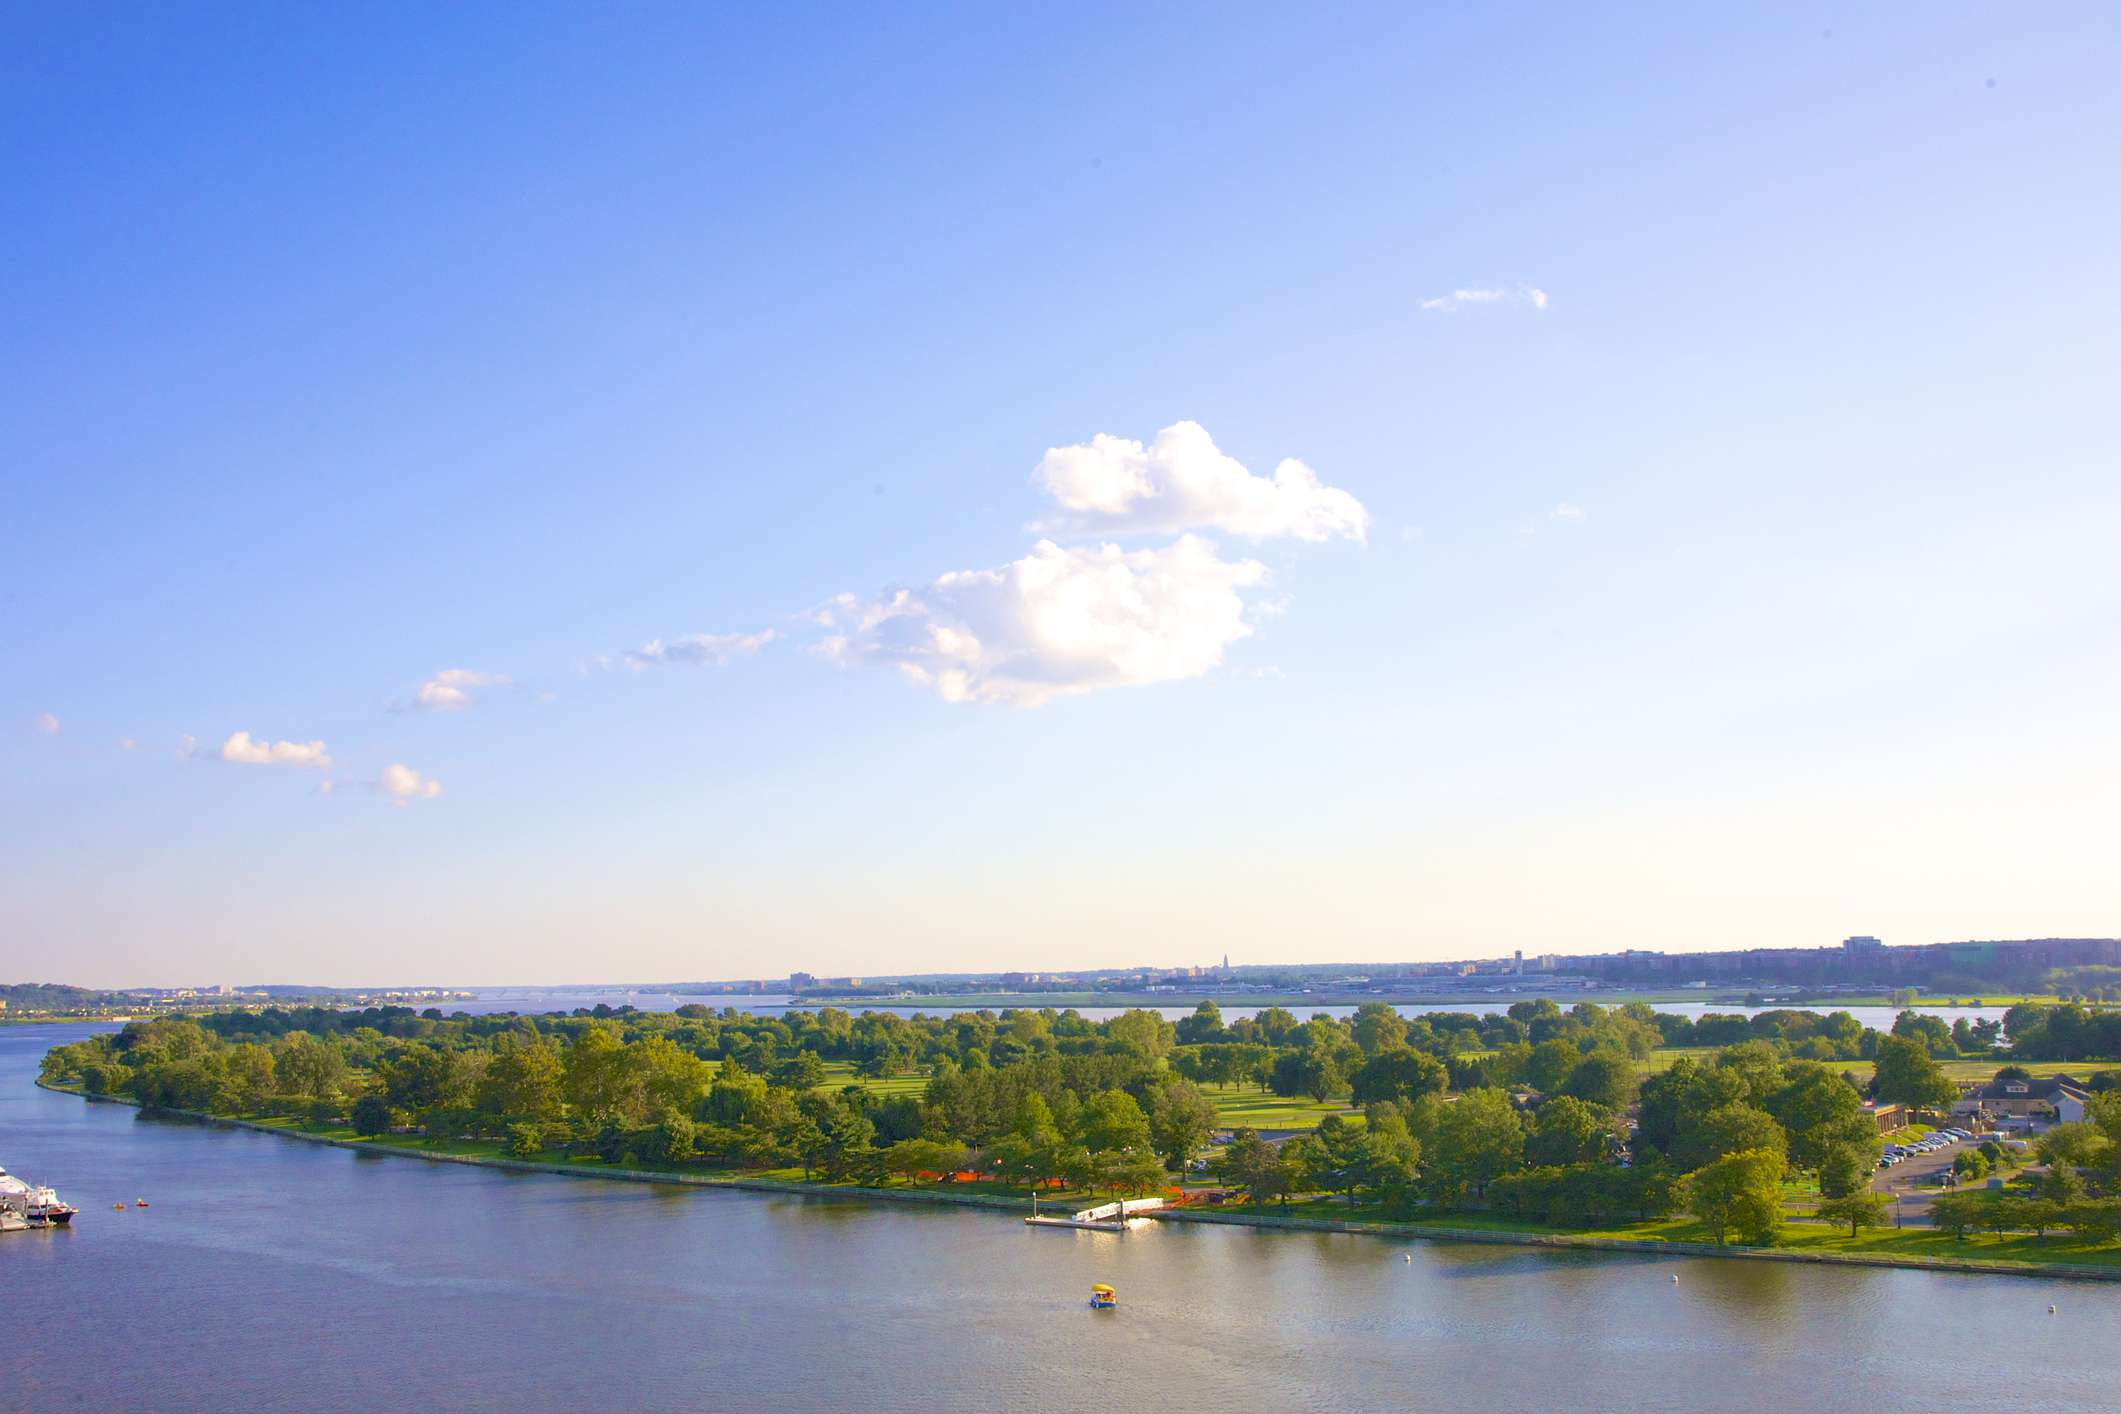 East East Potomac Park along Potomac River